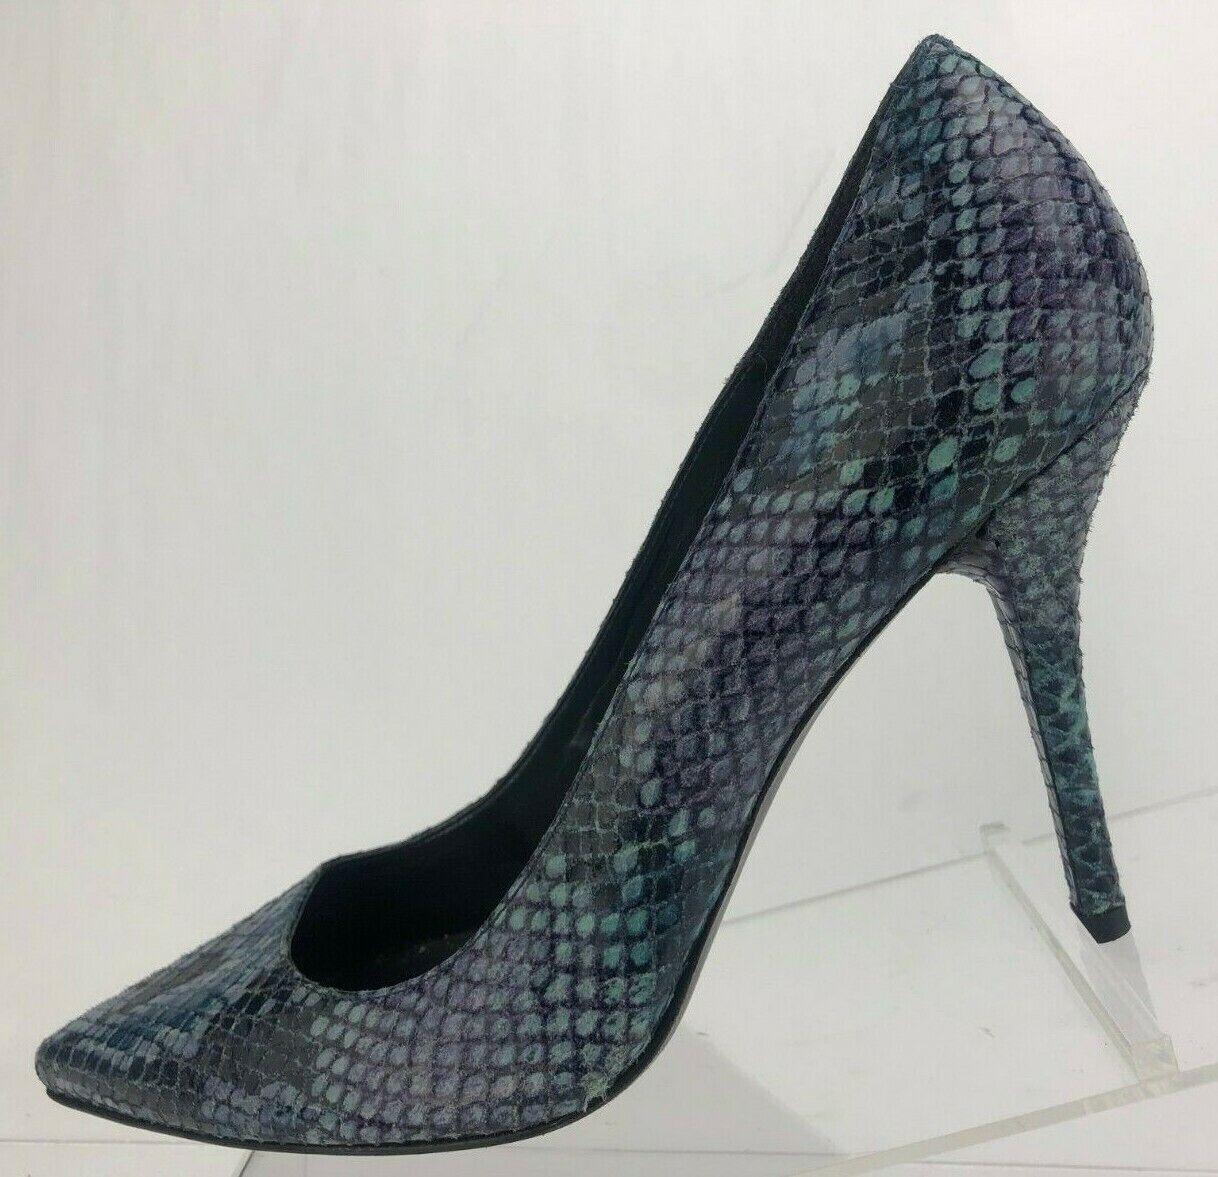 STUART WEITZMAN Escarpins Peau De Serpent MultiCouleure en cuir classique heels US 10